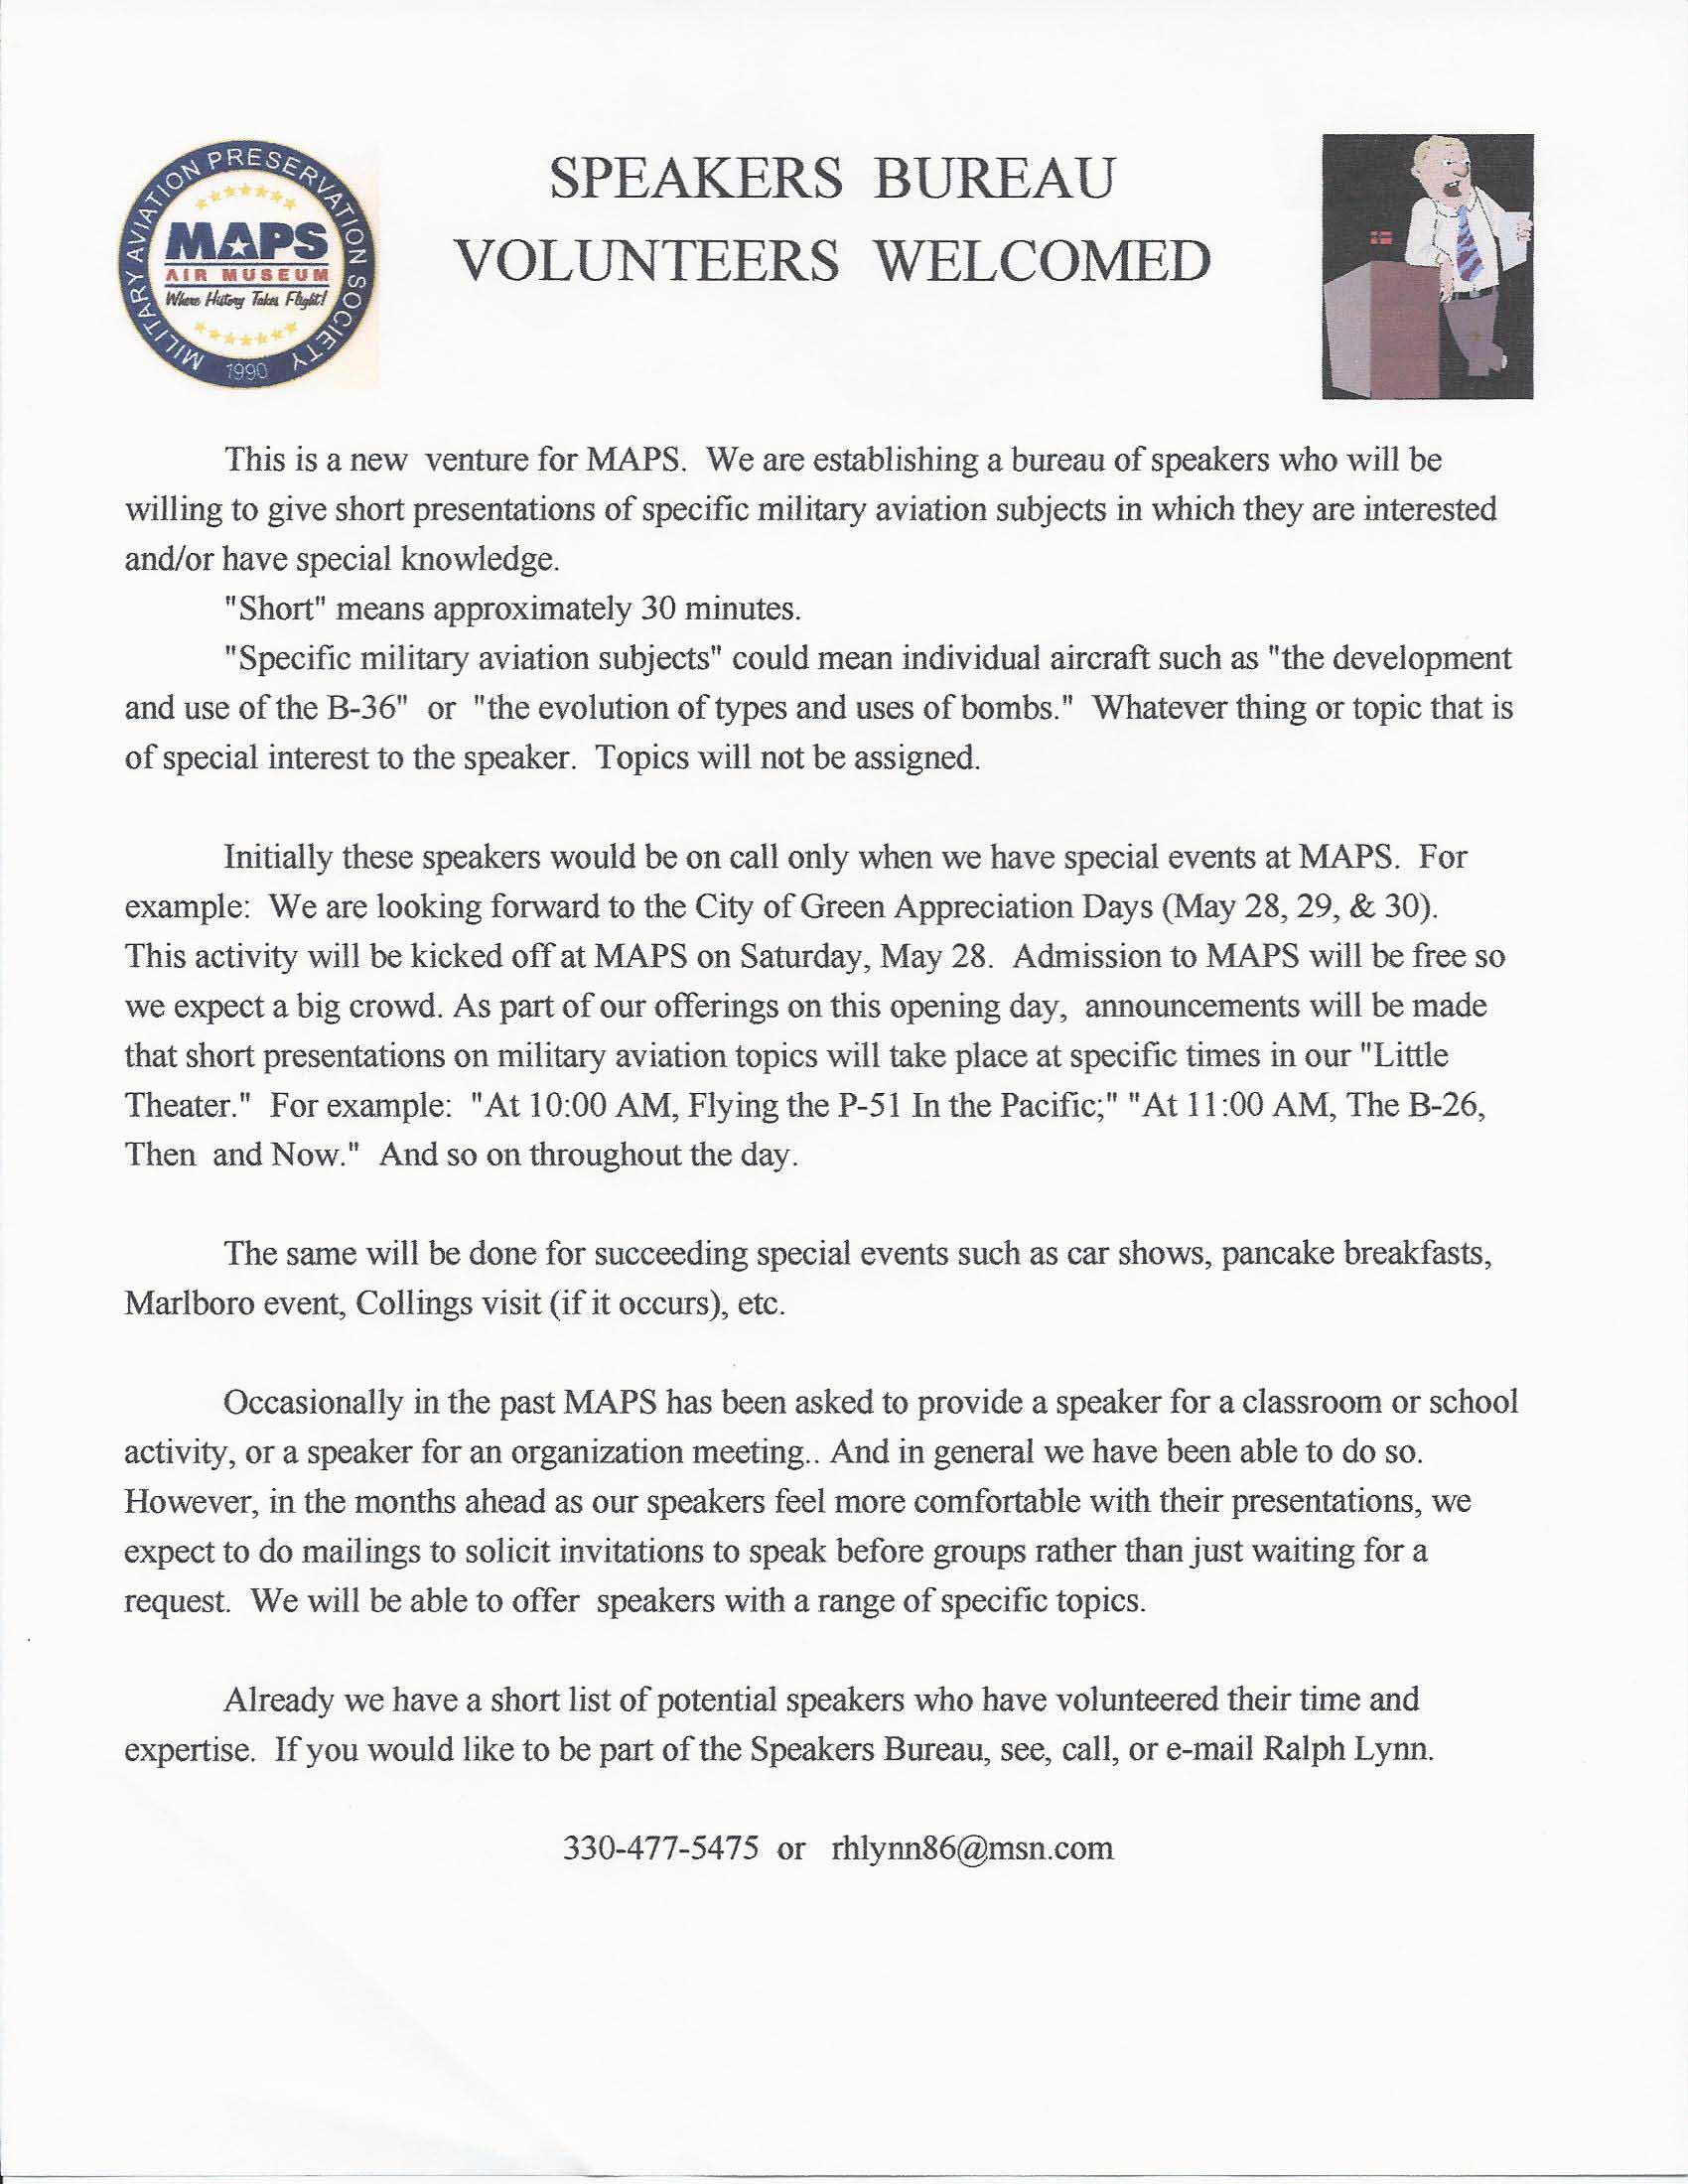 Speakers Bureau Volunteers Document